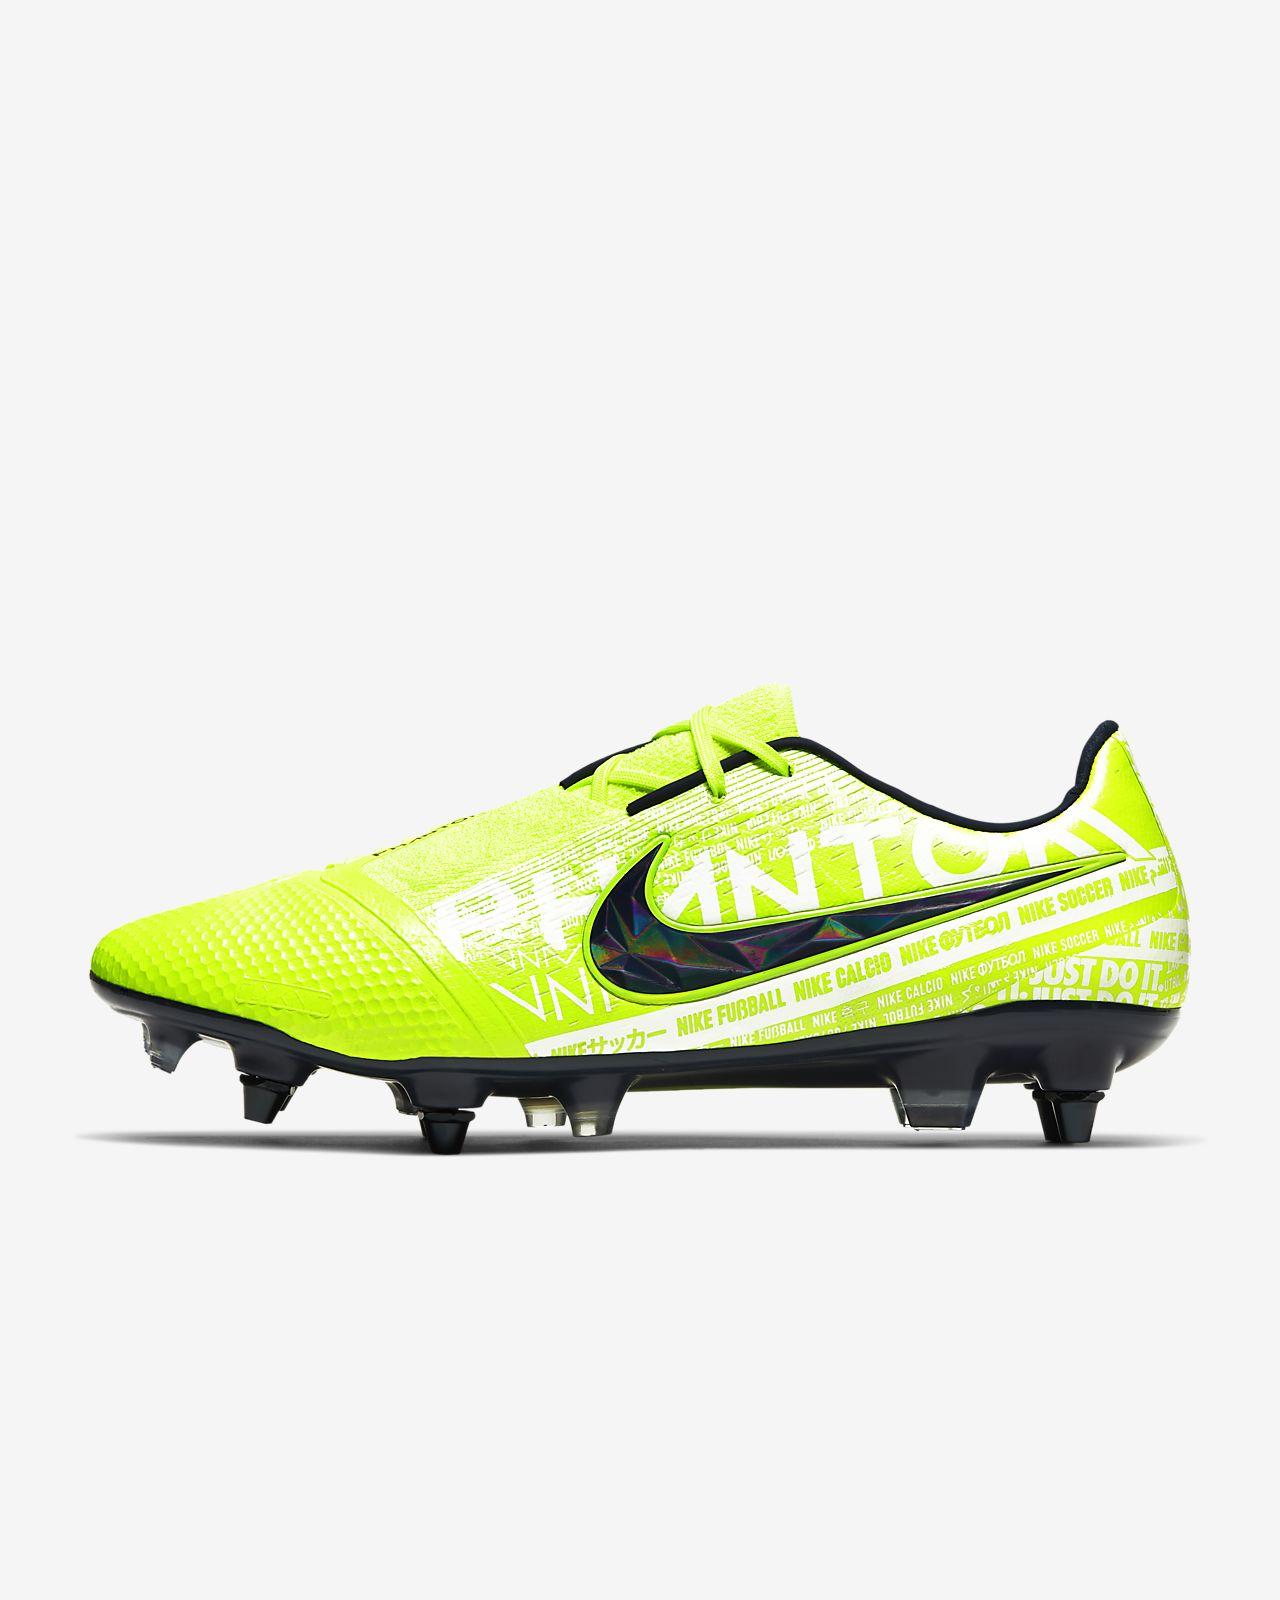 Chaussure de football à crampons pour terrain gras Nike Phantom Venom Elite SG Pro Anti Clog Traction